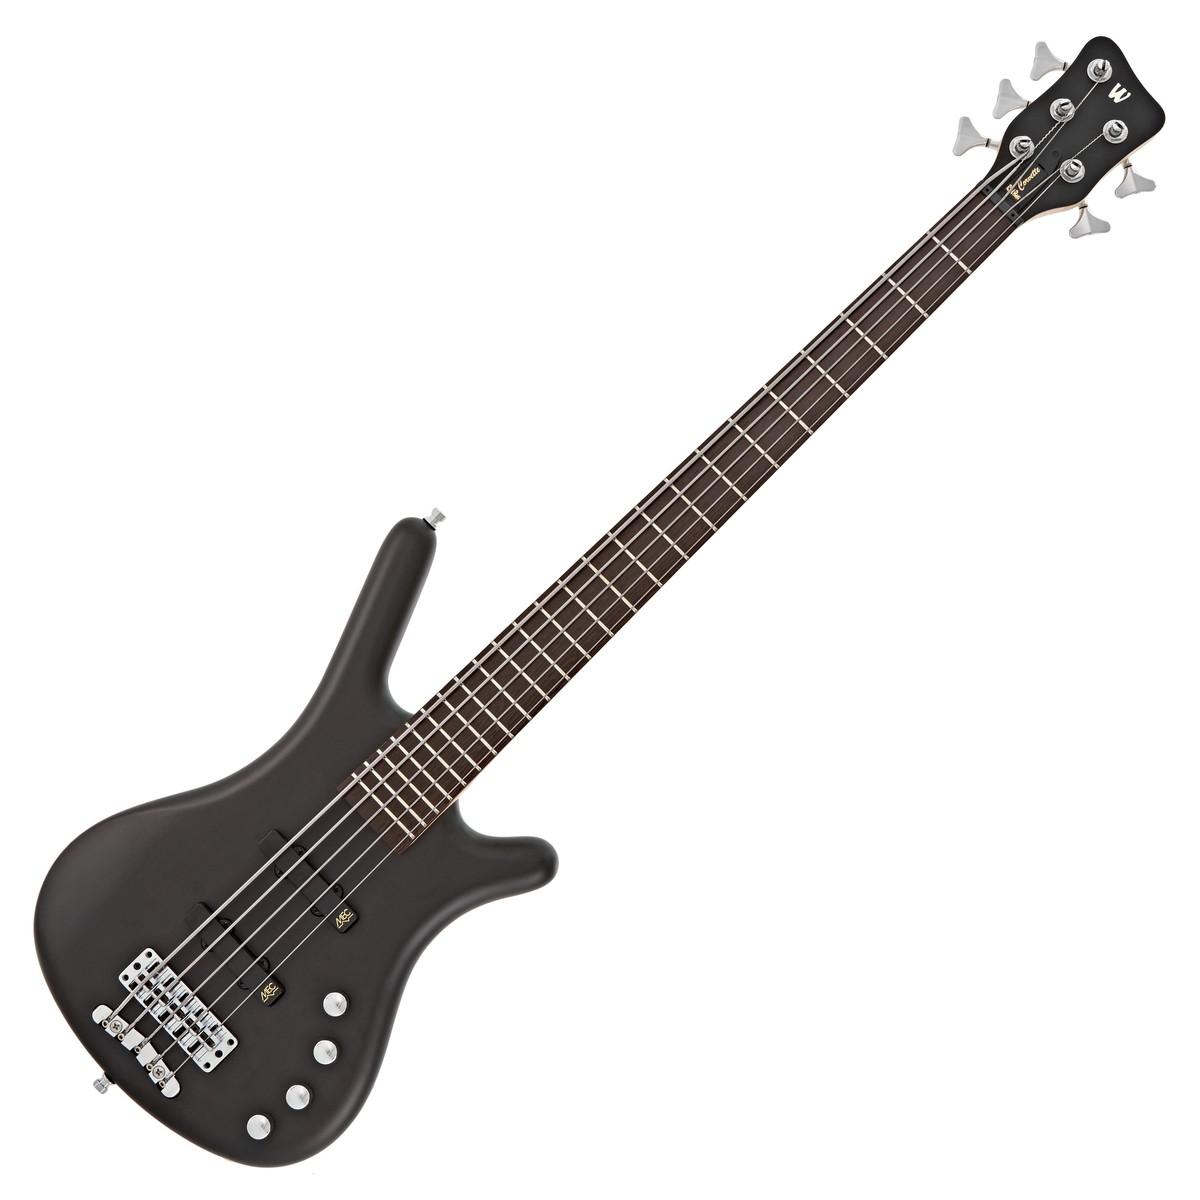 warwick rockbass corvette basic 5 string bass black at gear4music. Black Bedroom Furniture Sets. Home Design Ideas